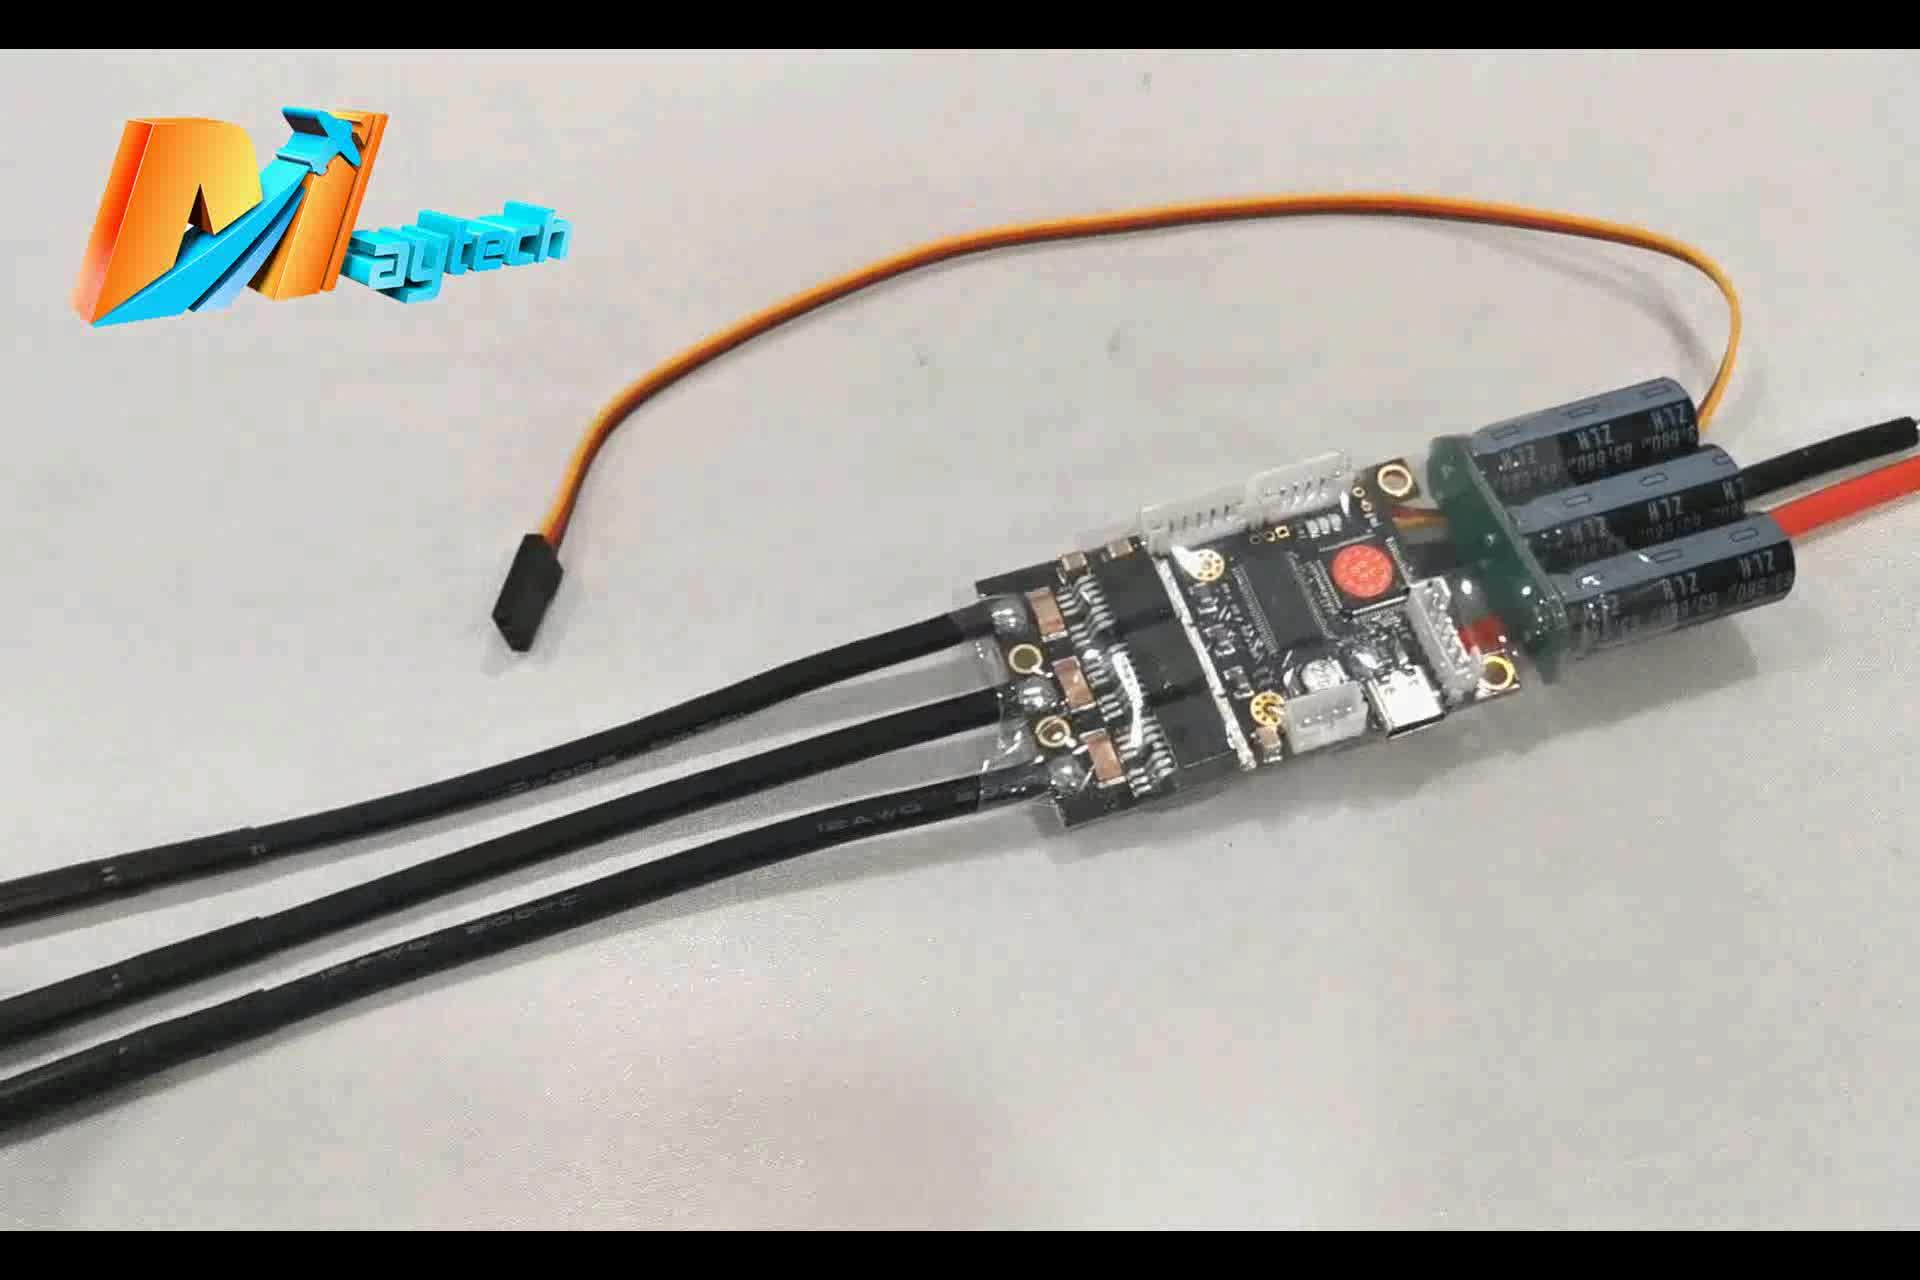 Maytech ใหม่ SuperFOC6.8 FOC ESC 50A ขึ้นอยู่กับ VESC6 สำหรับ longboard ไฟฟ้า DIY สเก็ตบอร์ดหุ่นยนต์หุ่นยนต์ต่อสู้